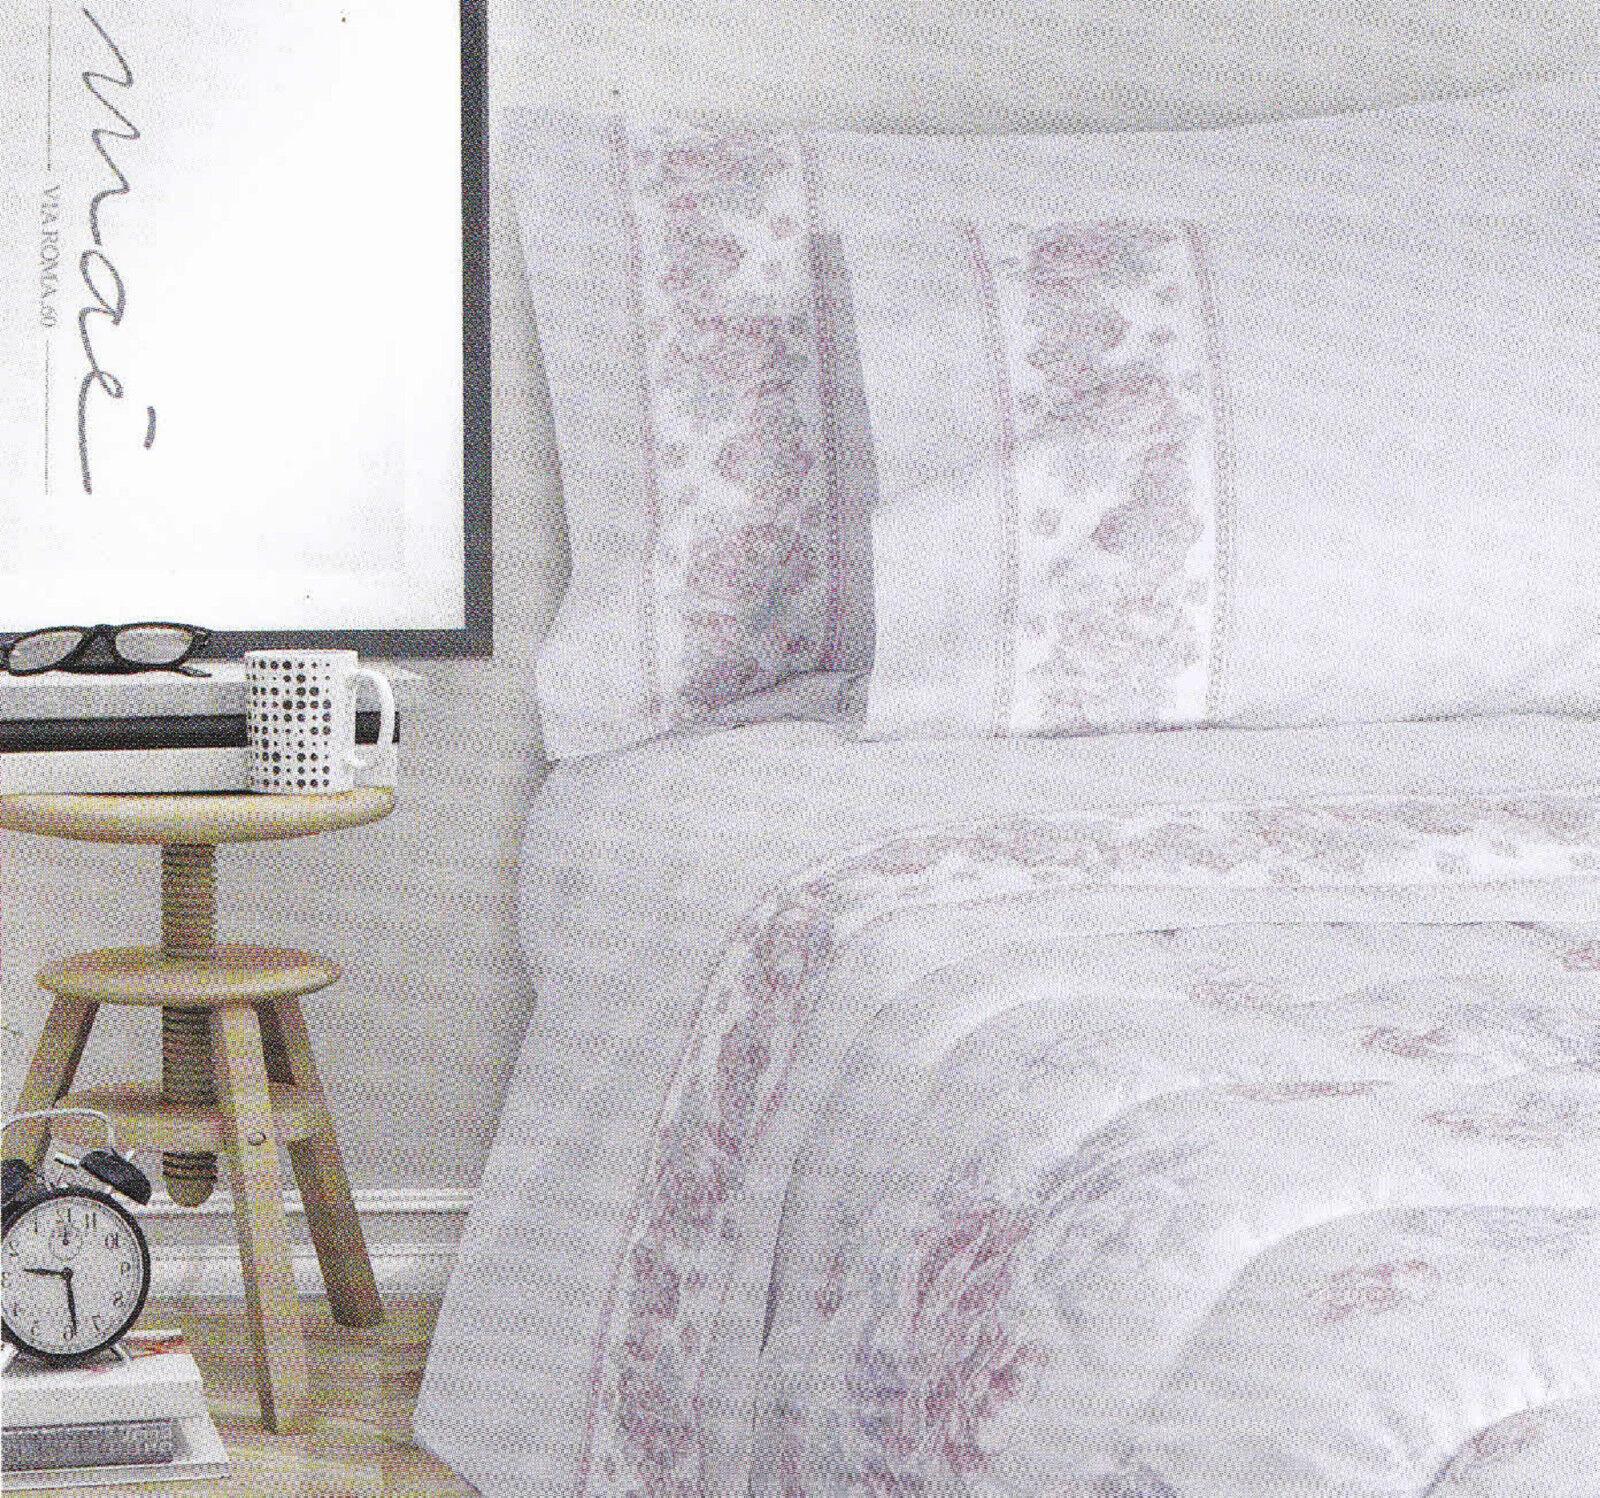 Completo letto, lenzuola calda Flanella MAE' DESERT pink Matrimoniale, 2 Piazze.